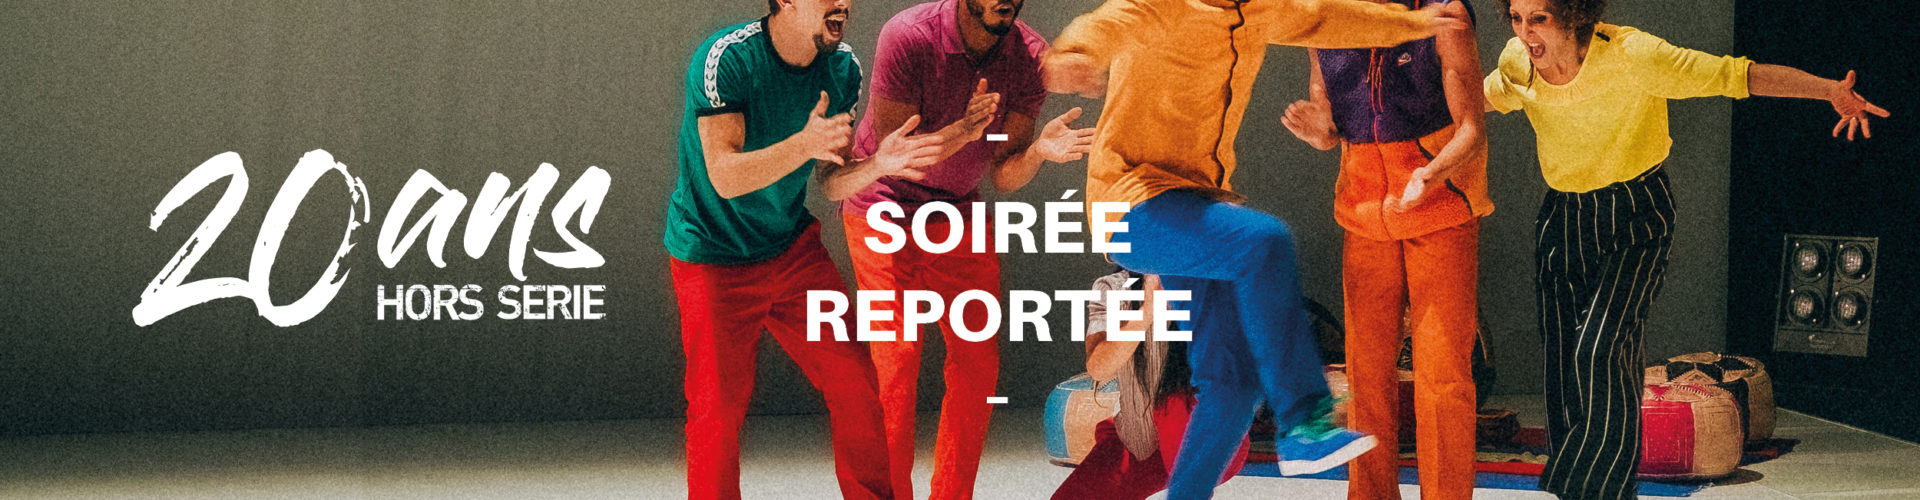 Soirée reportée . 20 ans Hors Série